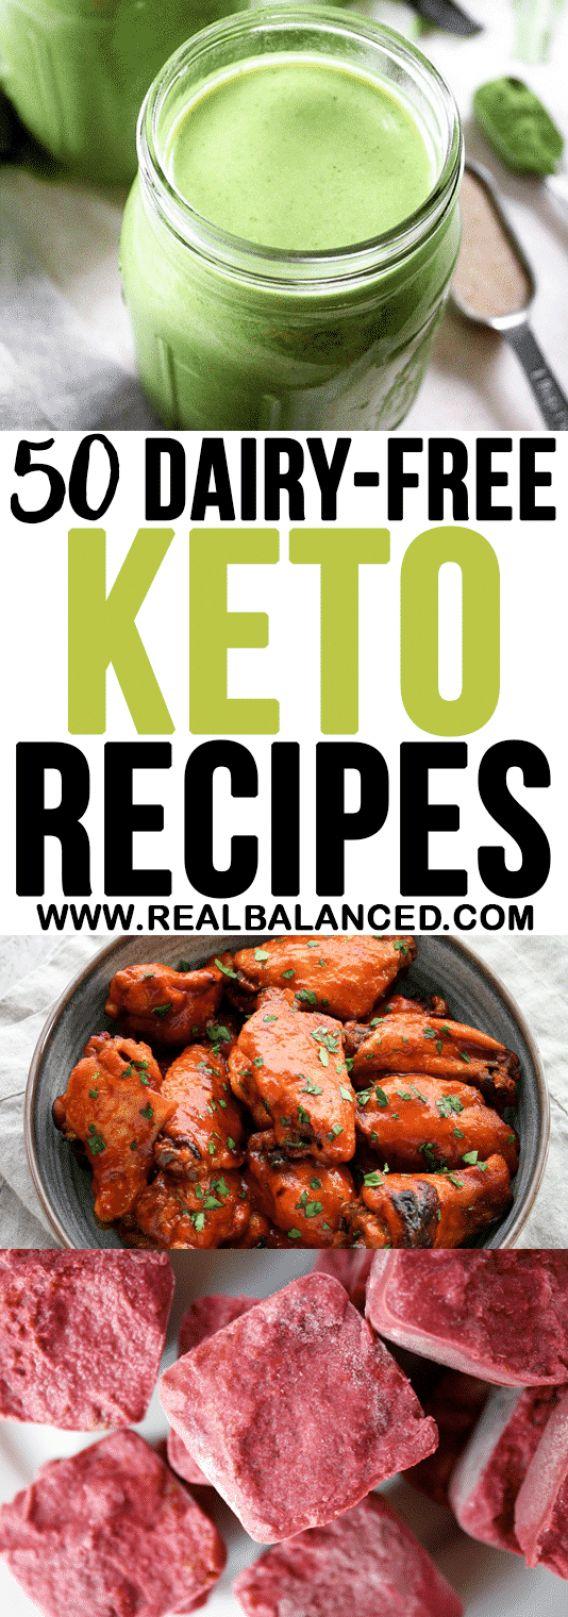 Lista cu alimente si suplimente pentru dieta keto   Cristian Margarit